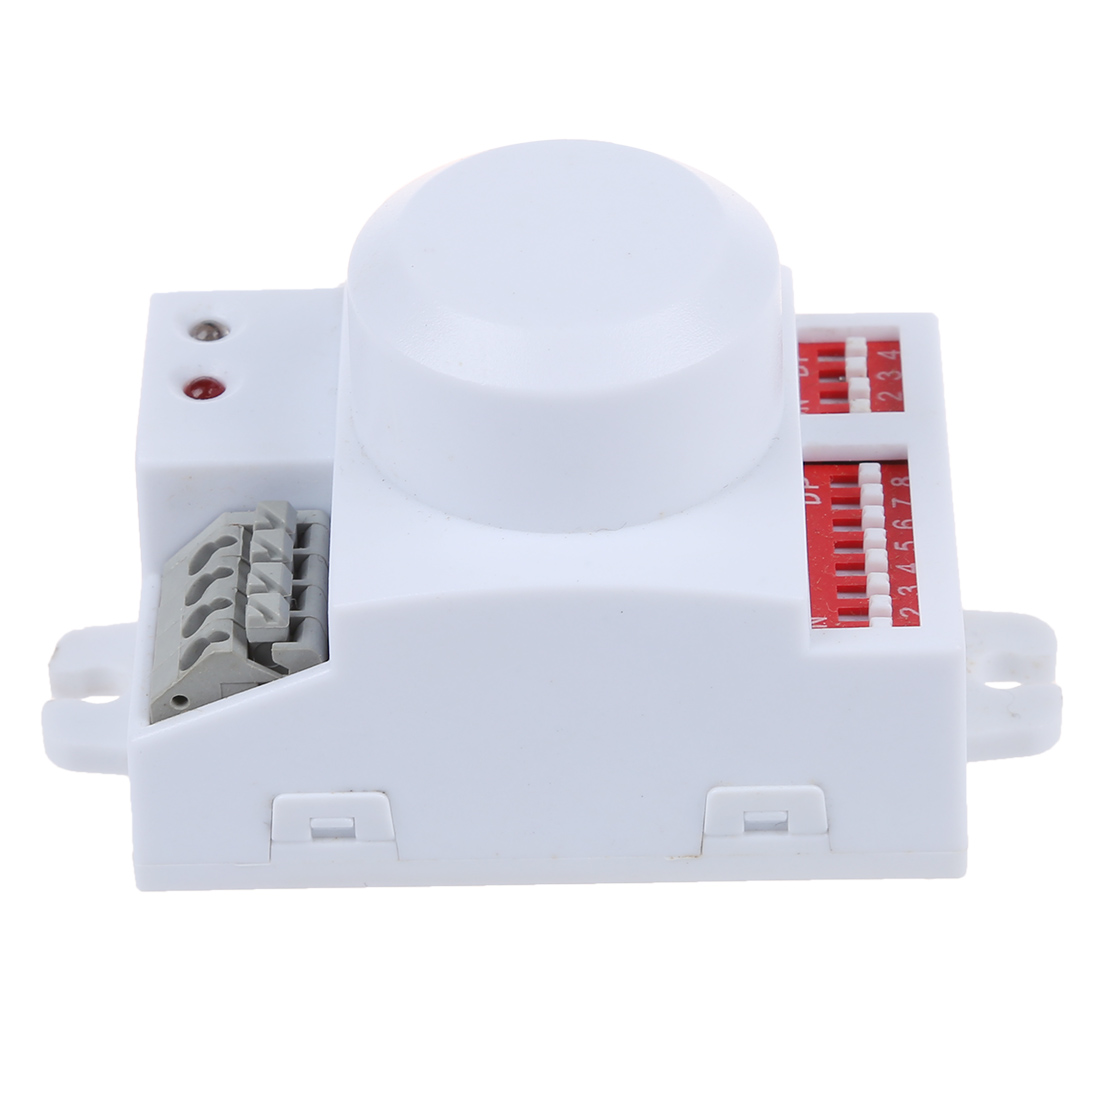 все цены на KSOL Microwave motion sensor switch Doppler Radar Wireless Module for lighting 220V - White онлайн